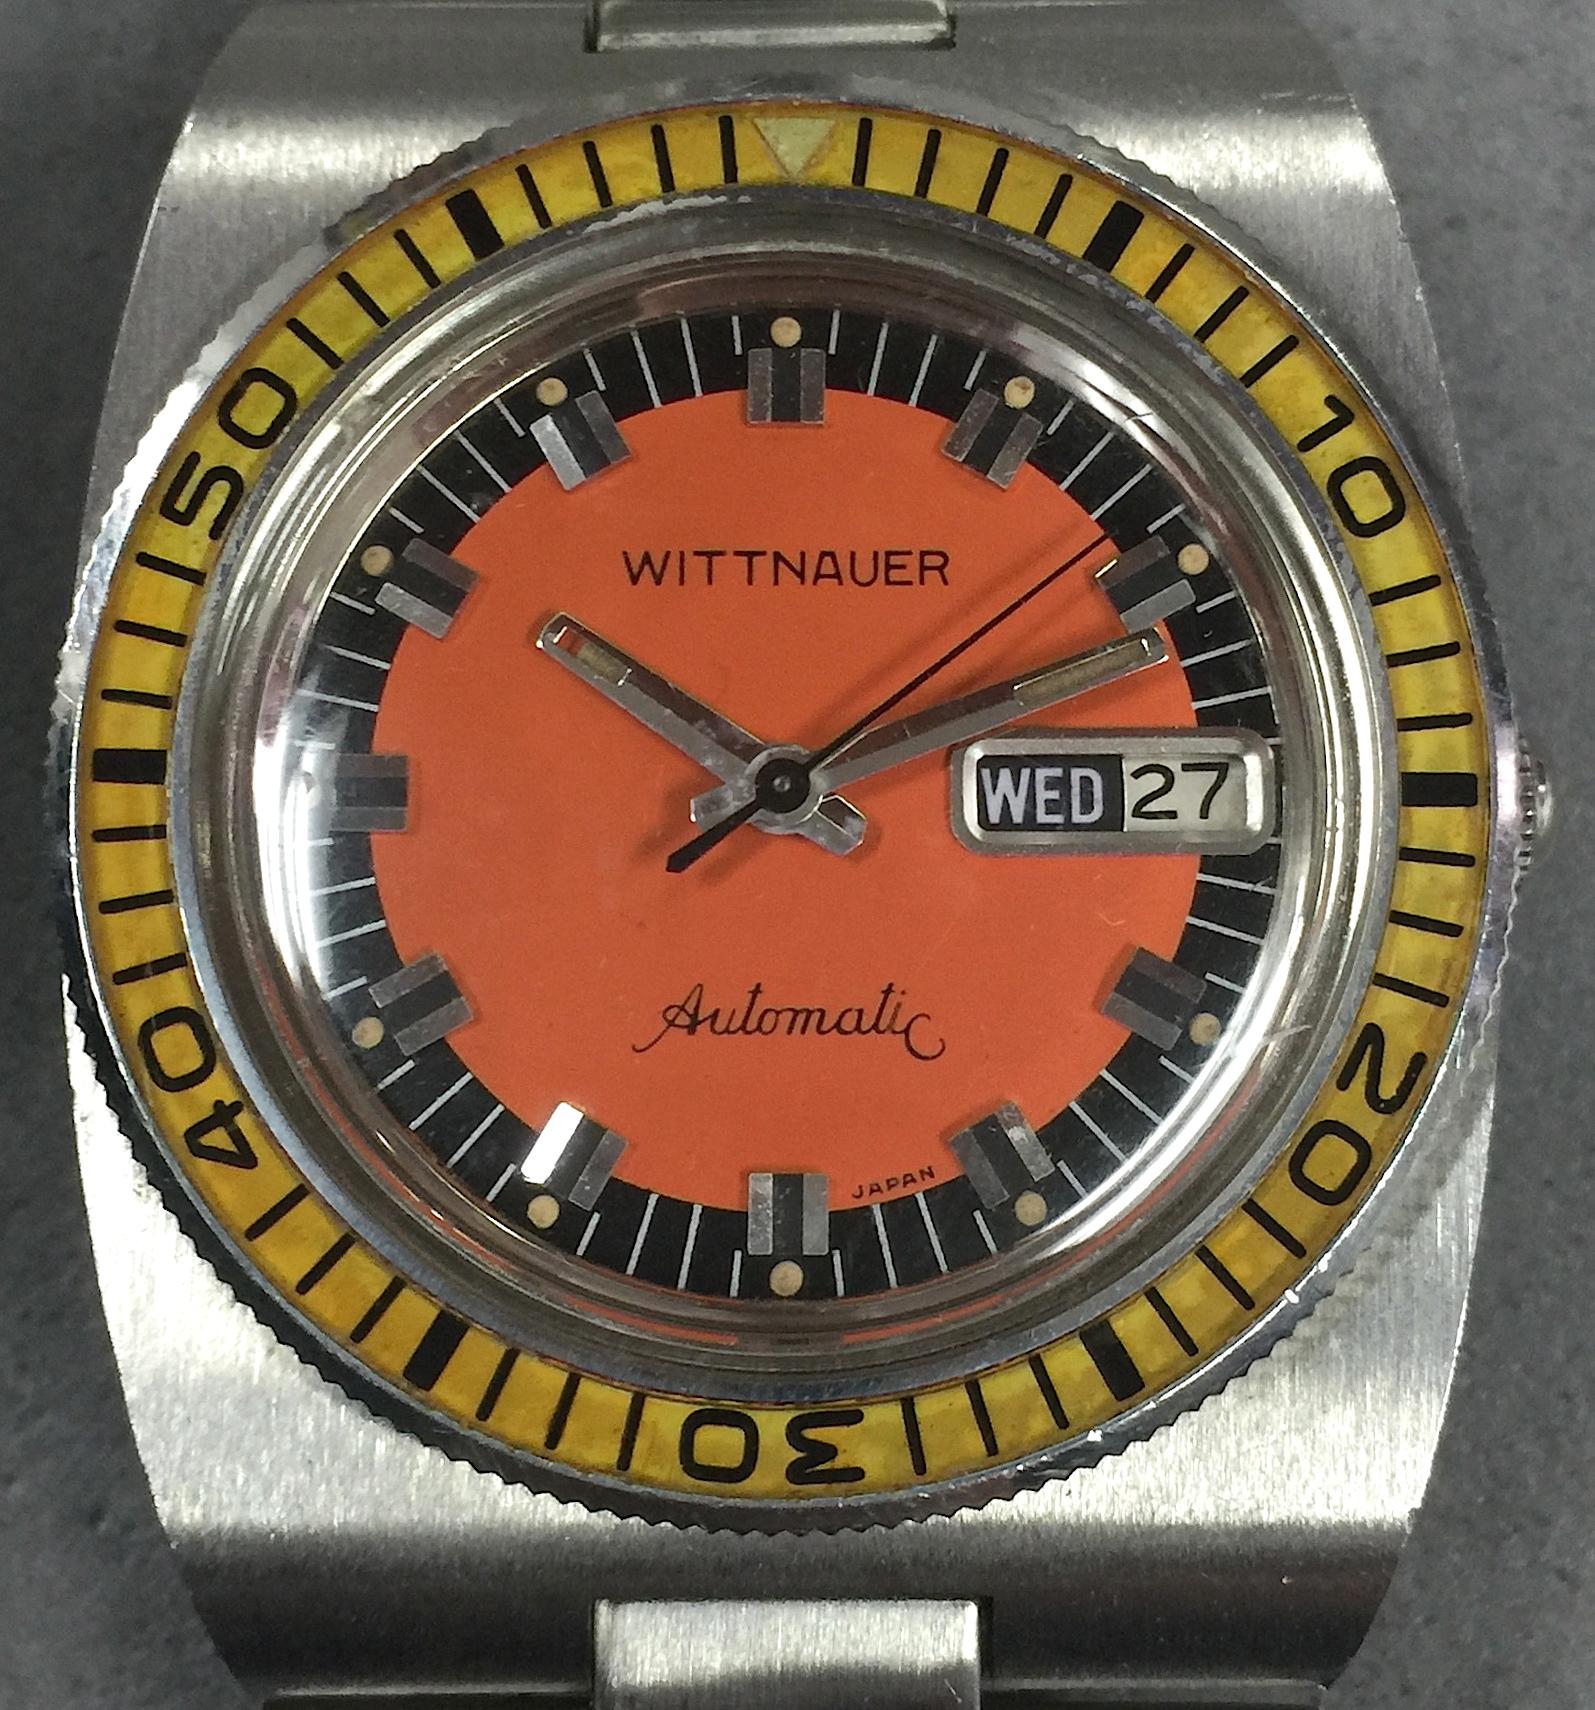 Vintage wittnauer divers watch w yellow bakelite bezel and orange dial rare - Orange dive watch ...